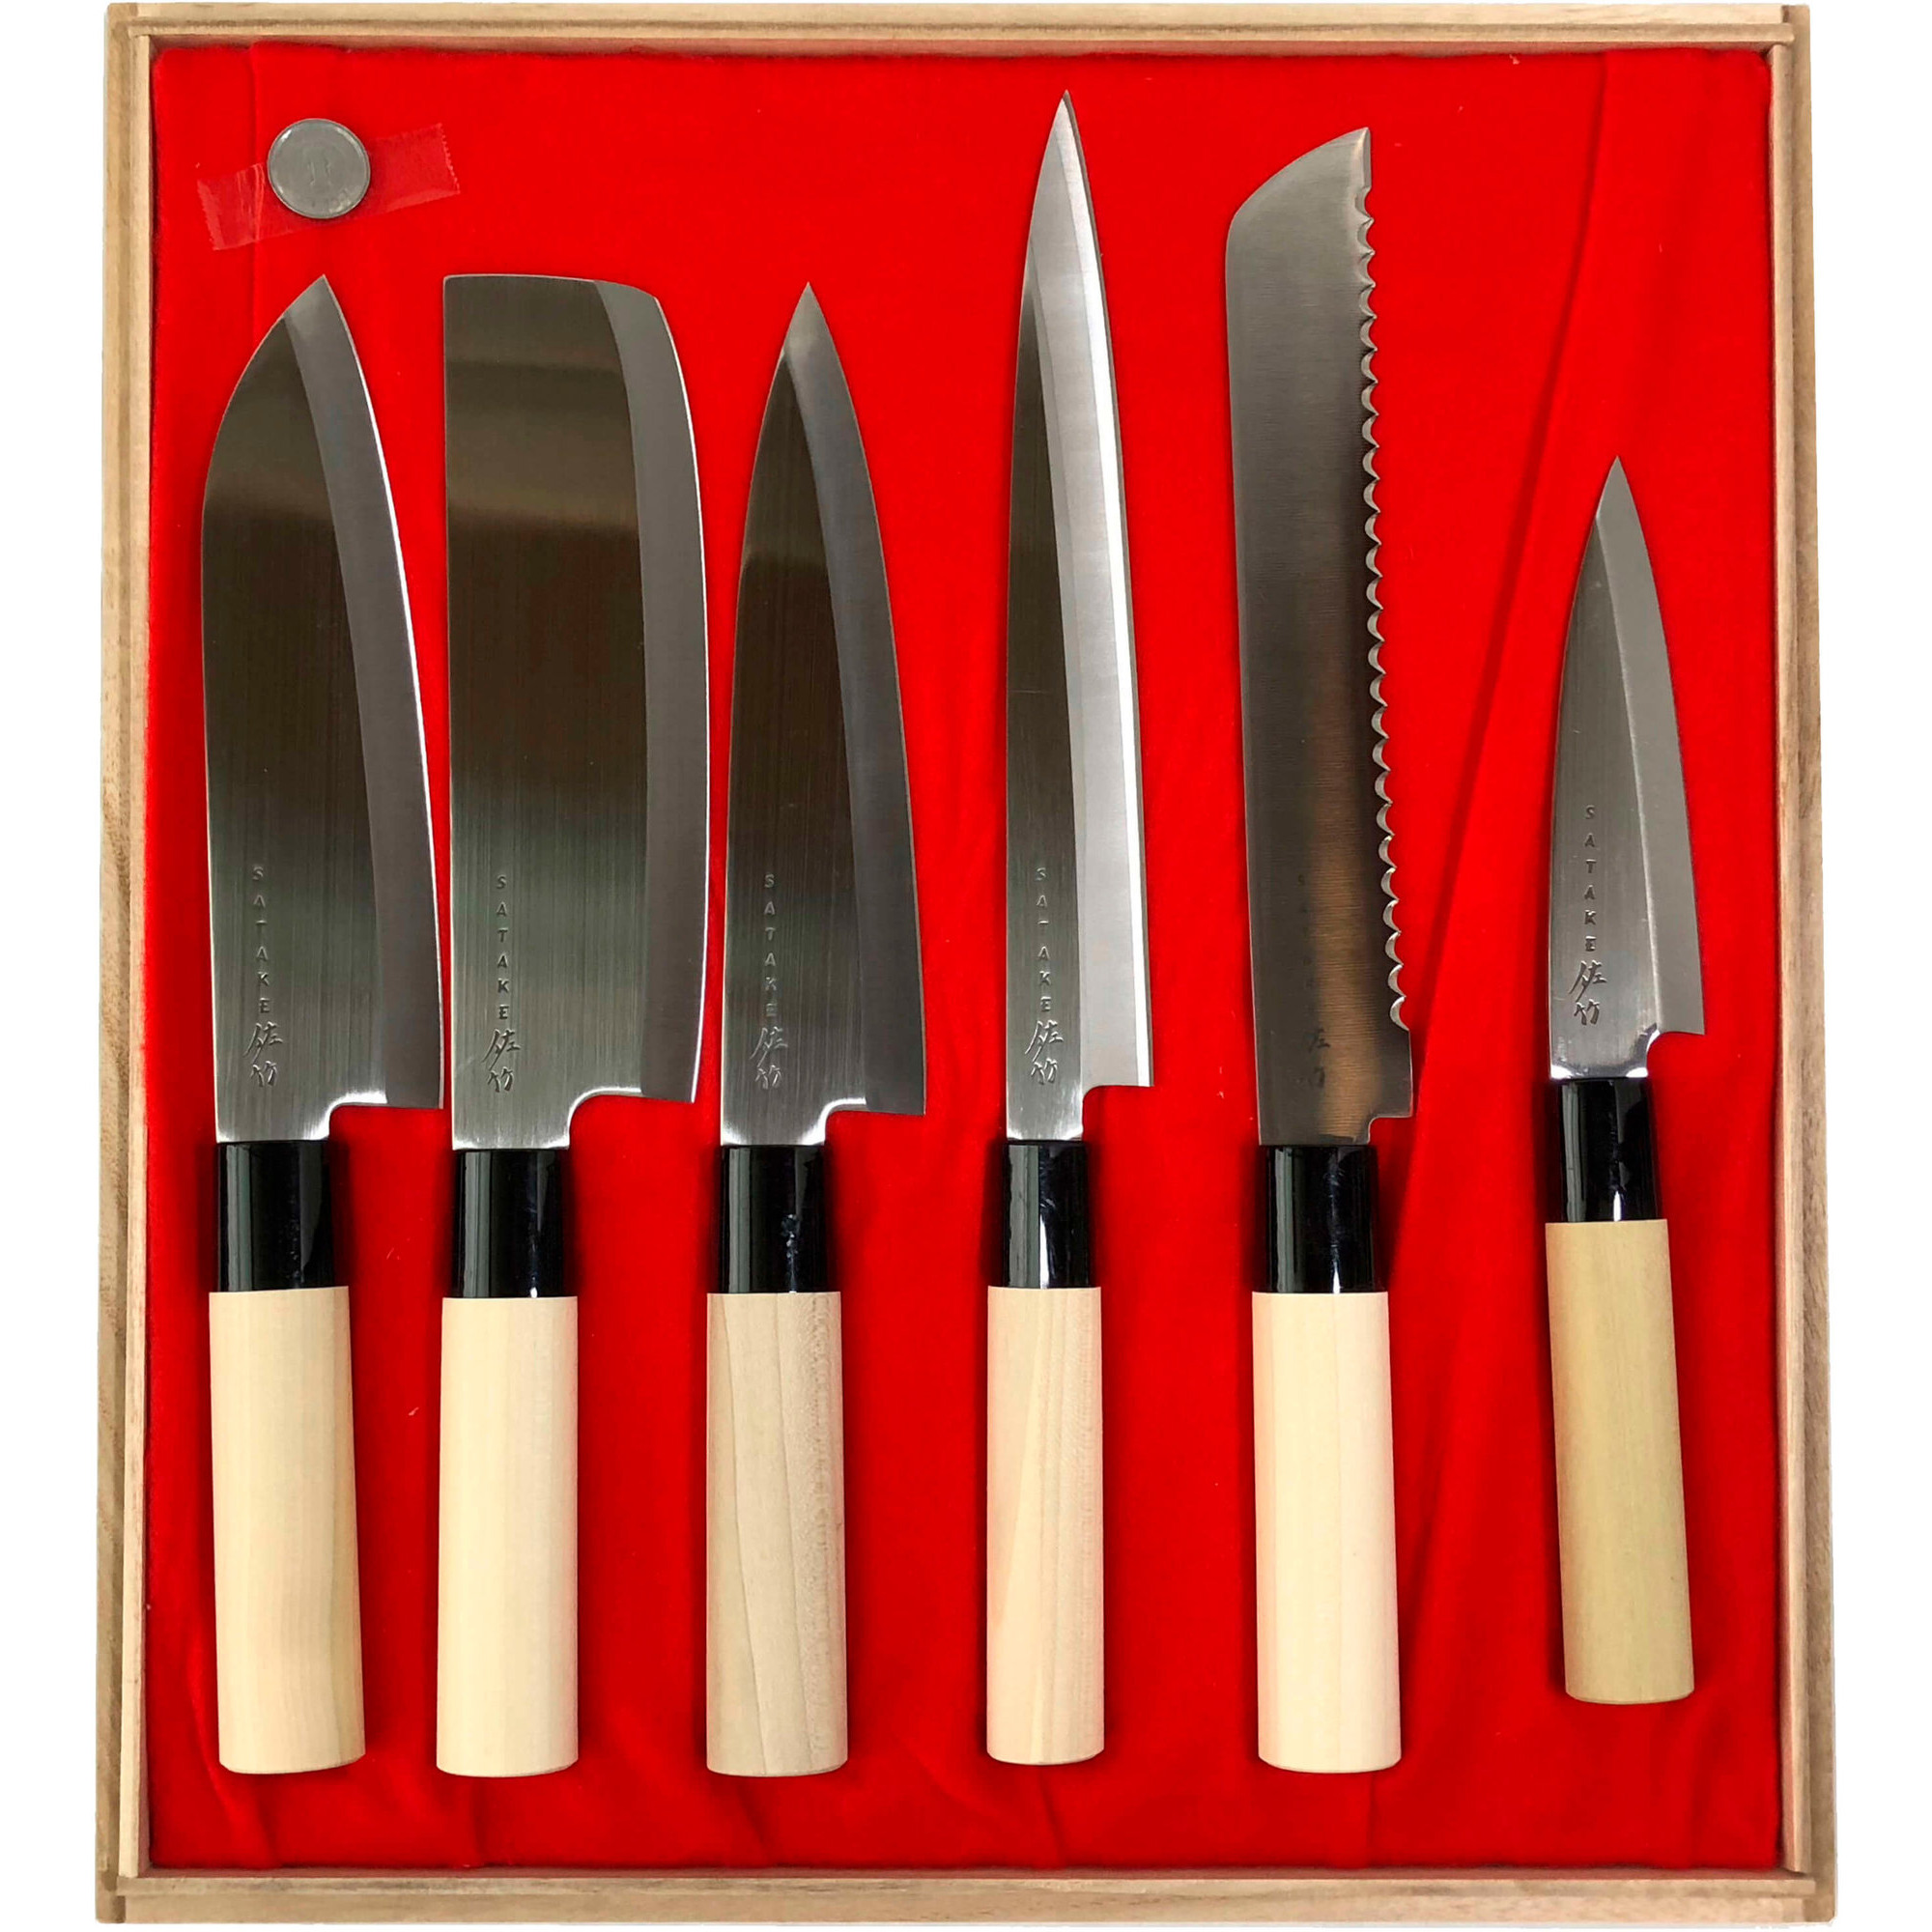 Satake Houcho Knivset i Balsabox sex knivar